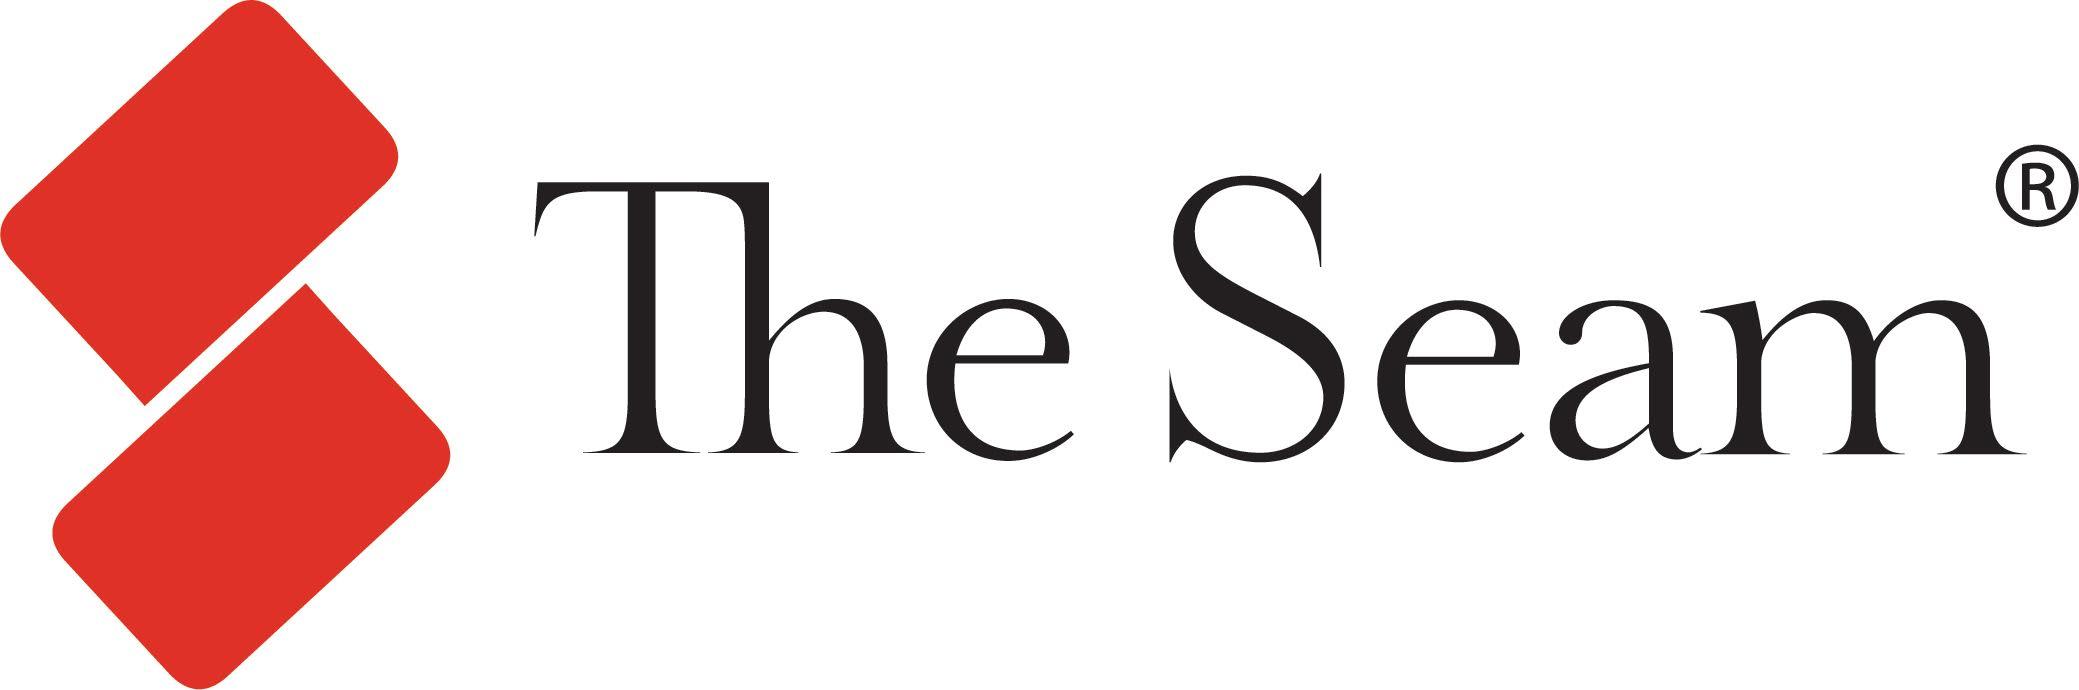 TheSeam-logo.jpg